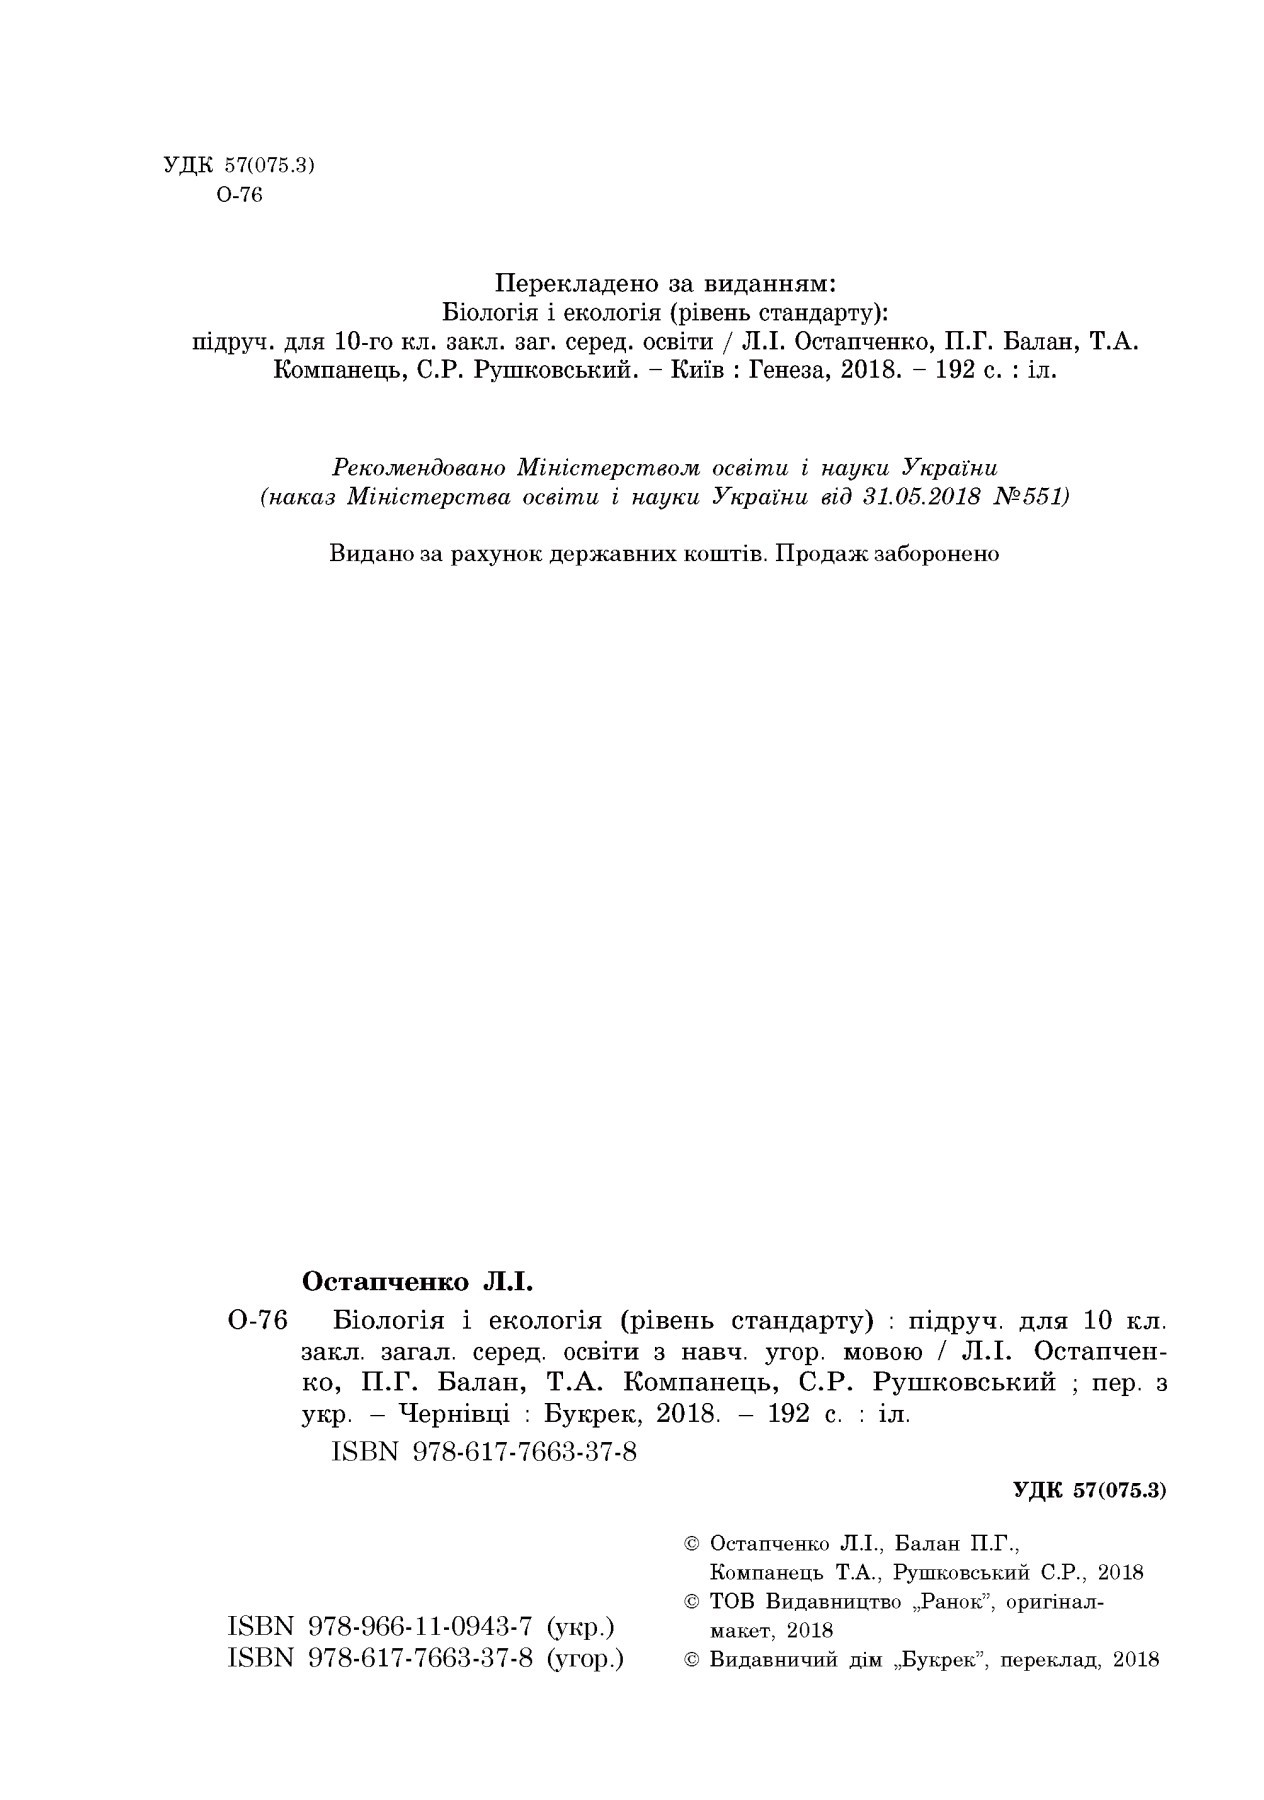 a diphyllobothriasis végleges gazdaszervezet